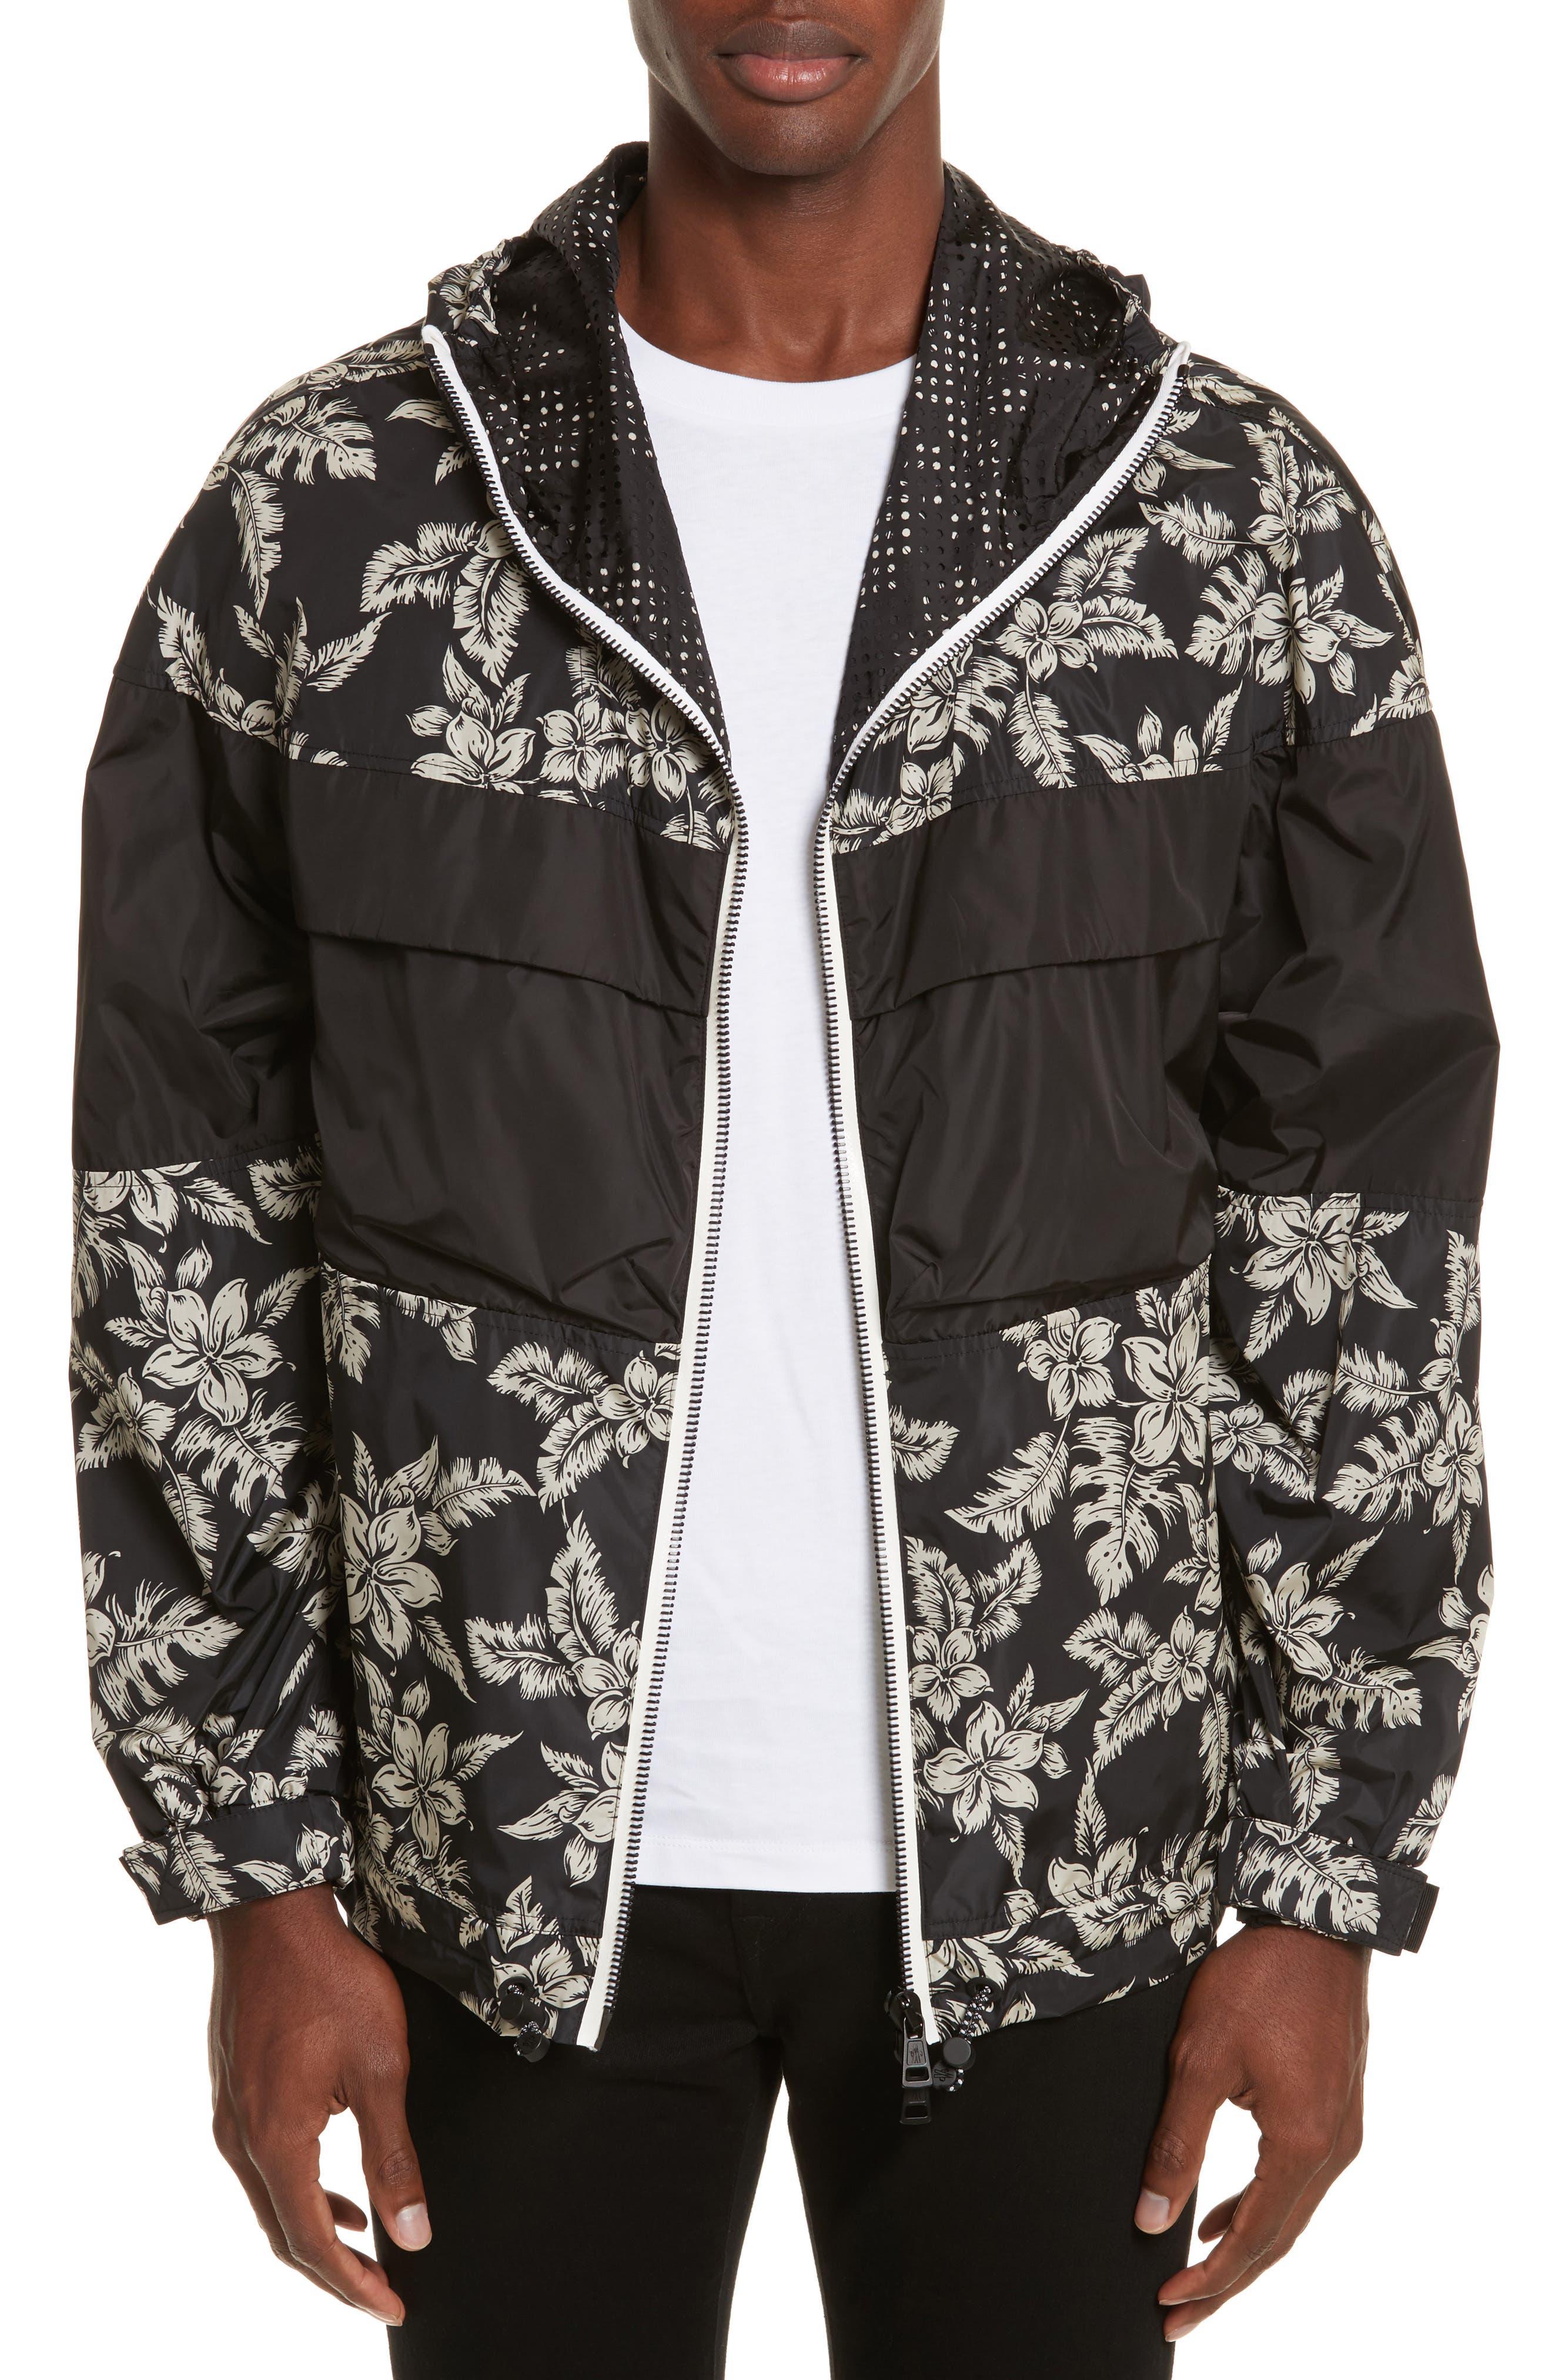 Thiou Floral Print Jacket,                             Main thumbnail 1, color,                             BLACK